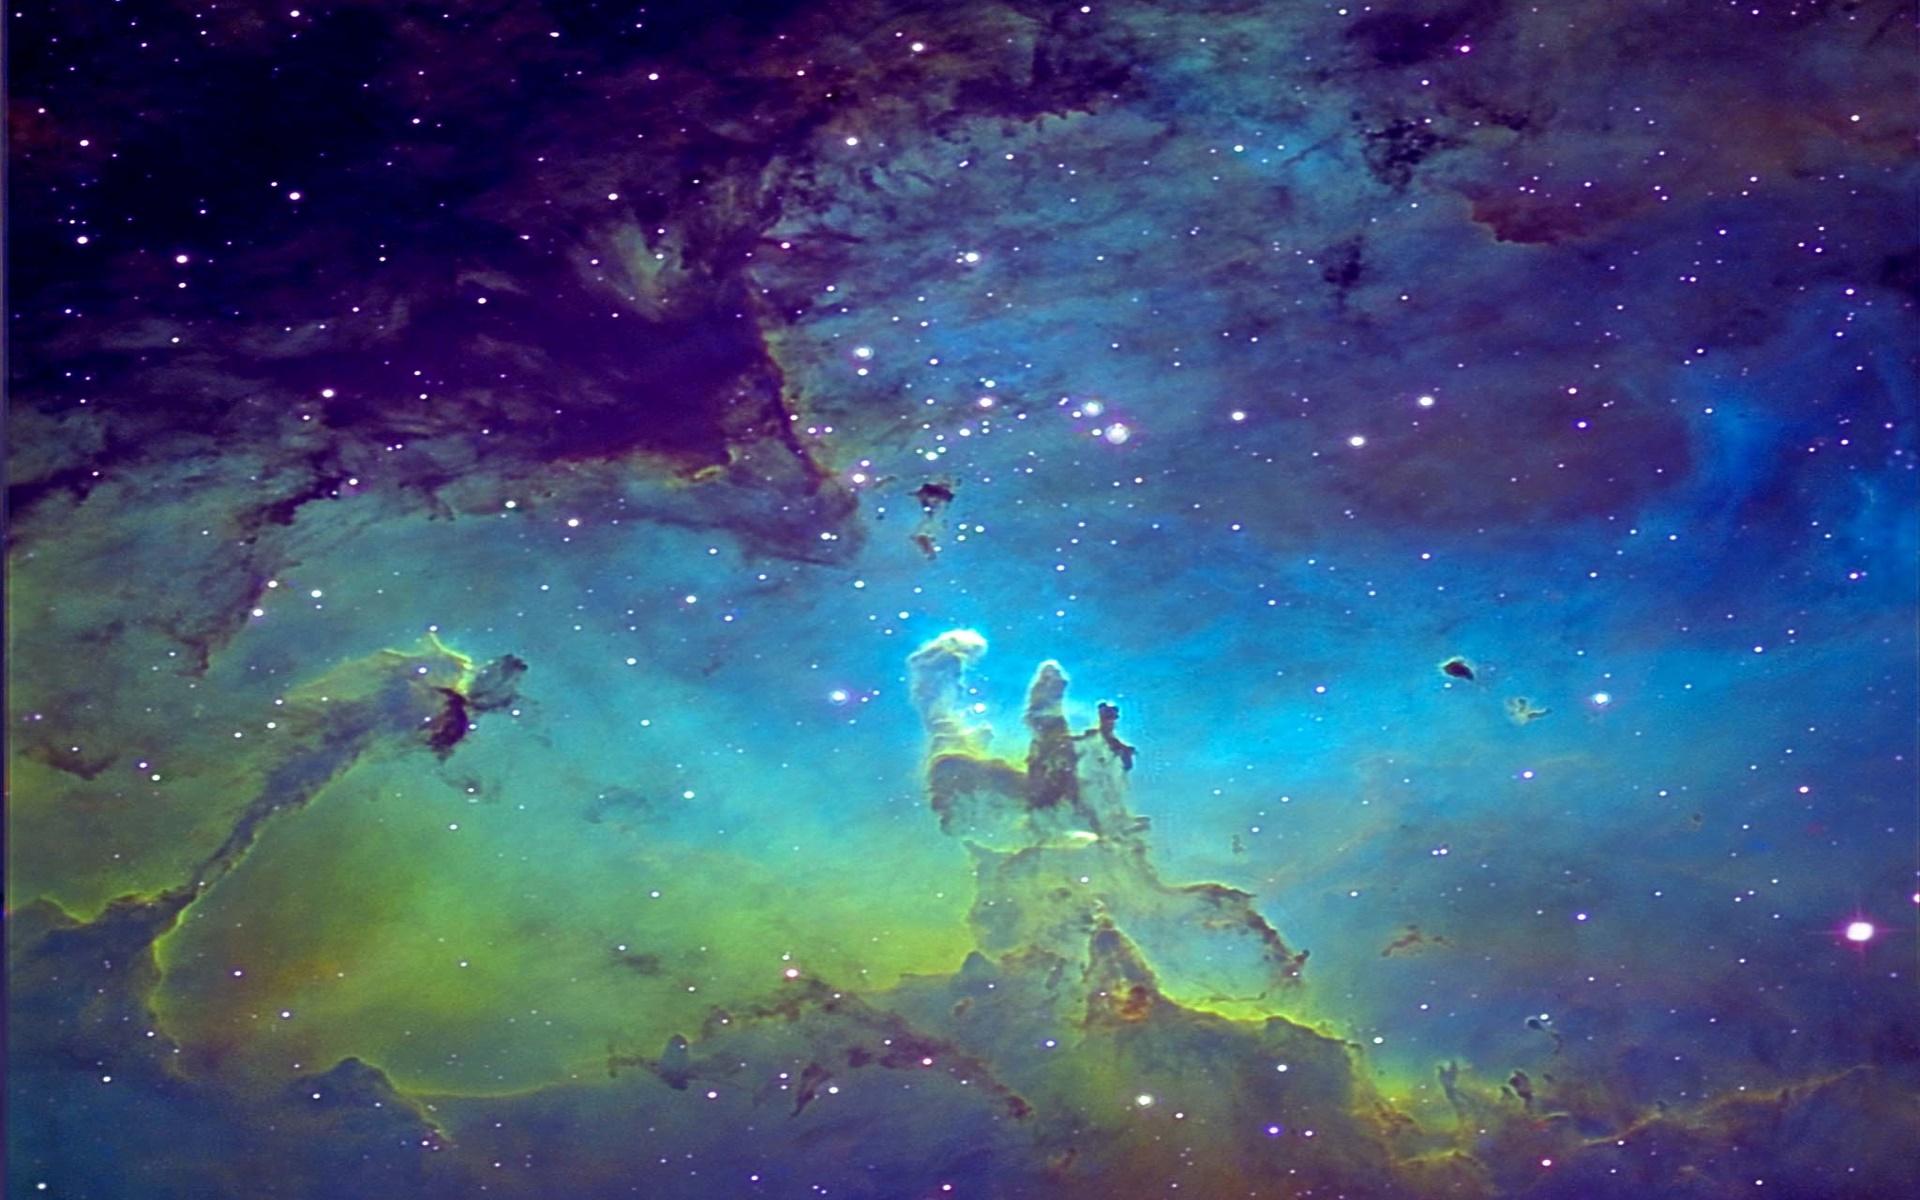 Galaxy Wallpaper Tumblr 026